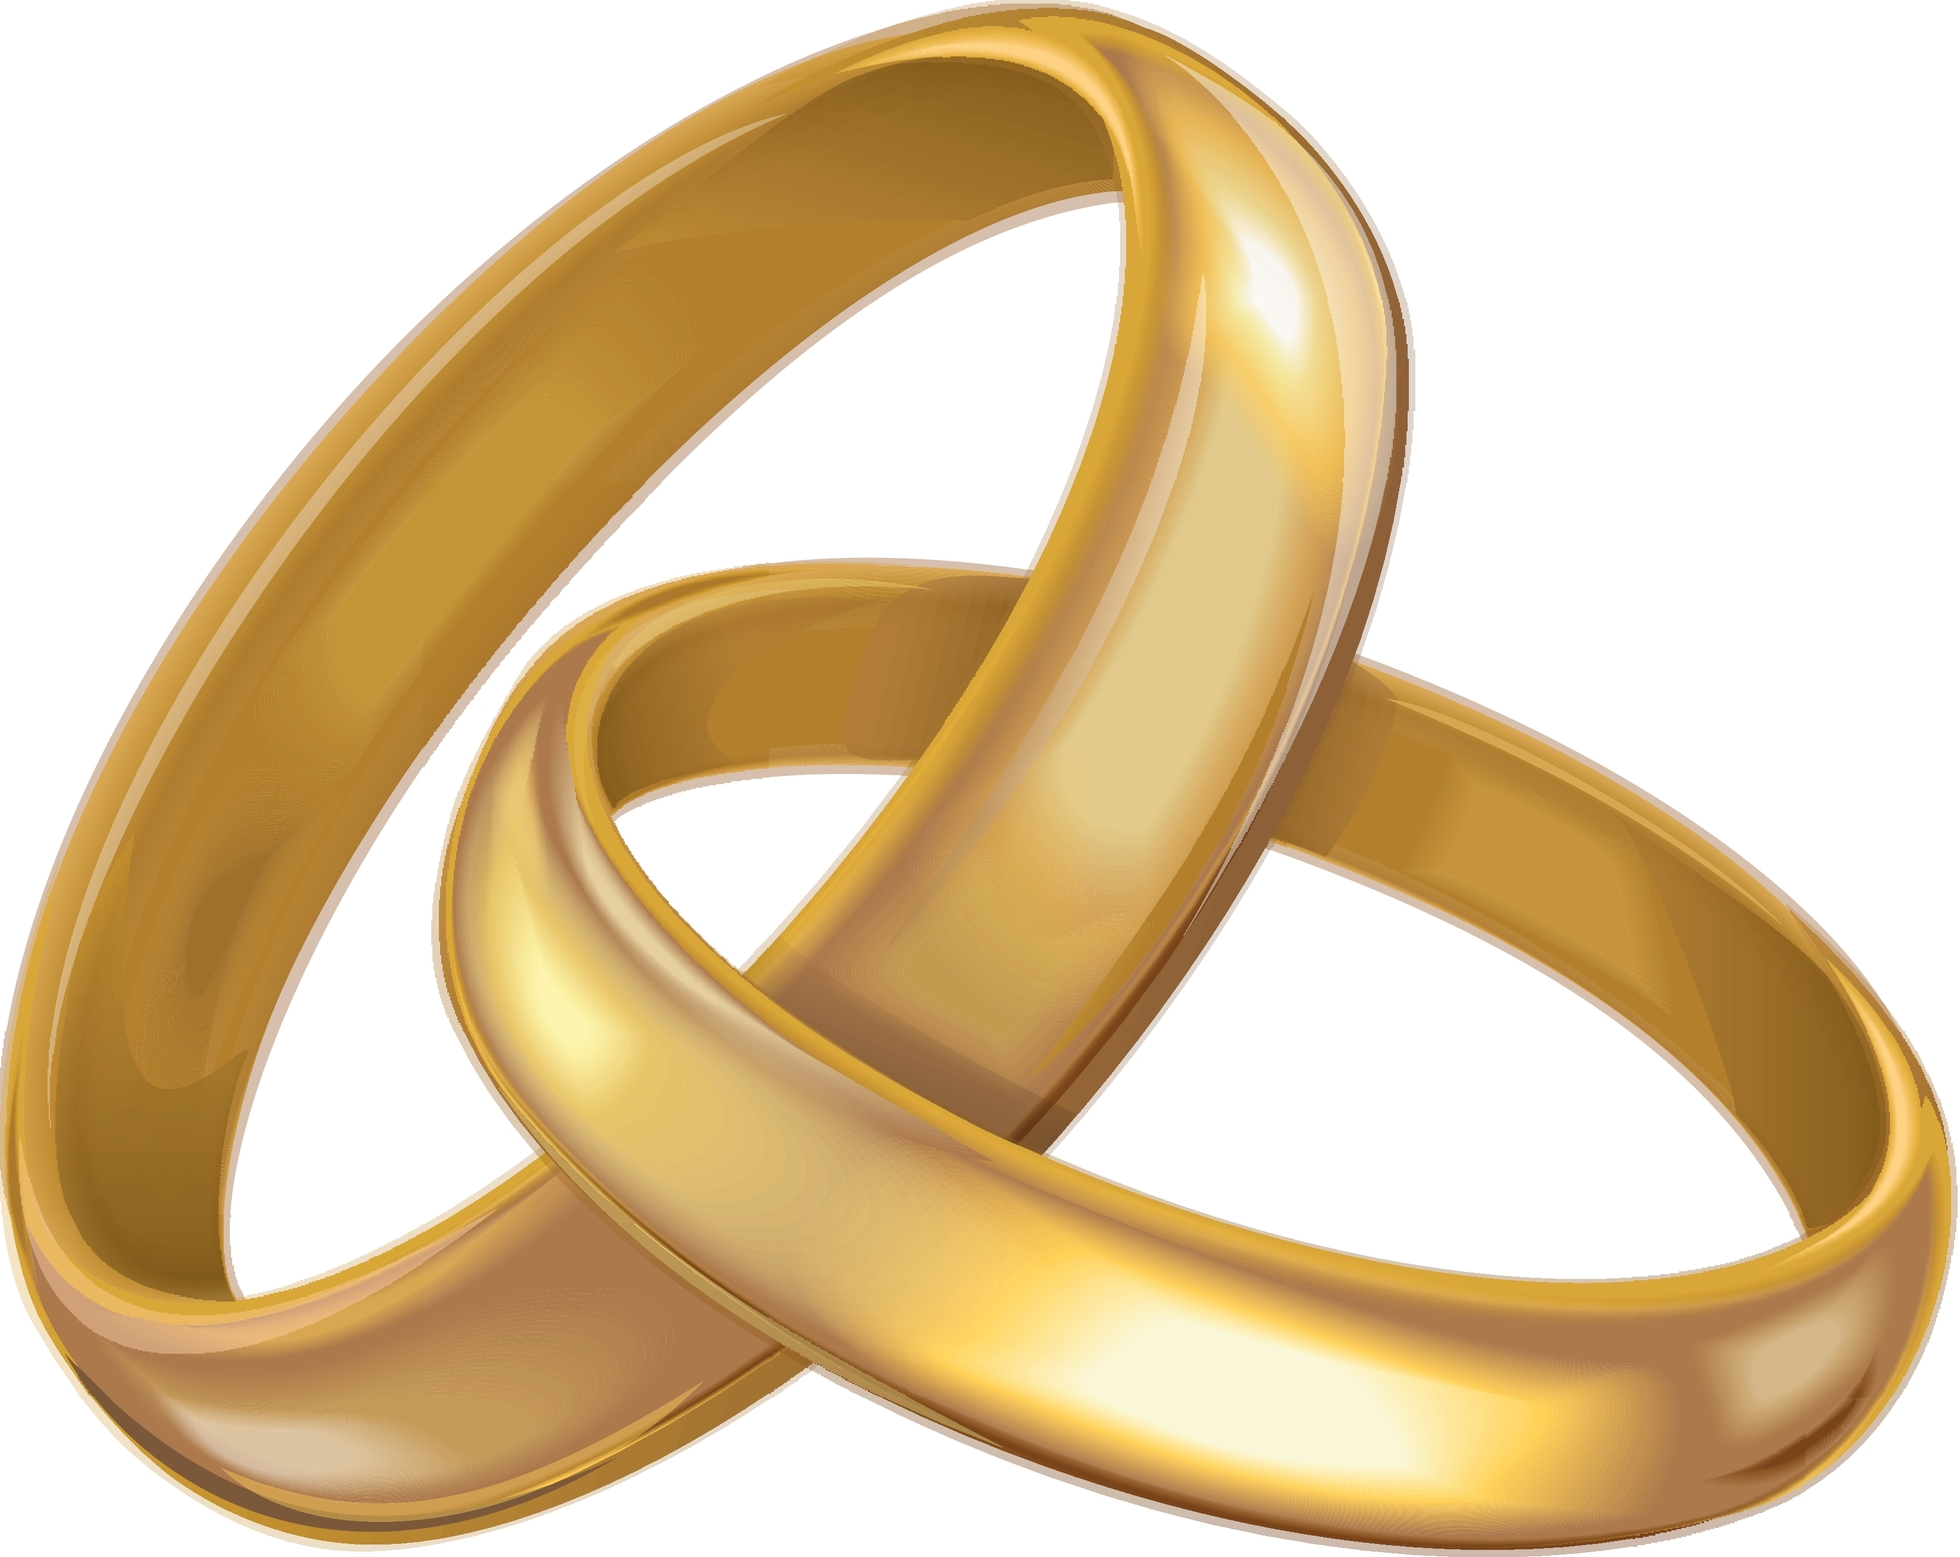 Single clipart wedding band Wedding sells diamond and bands